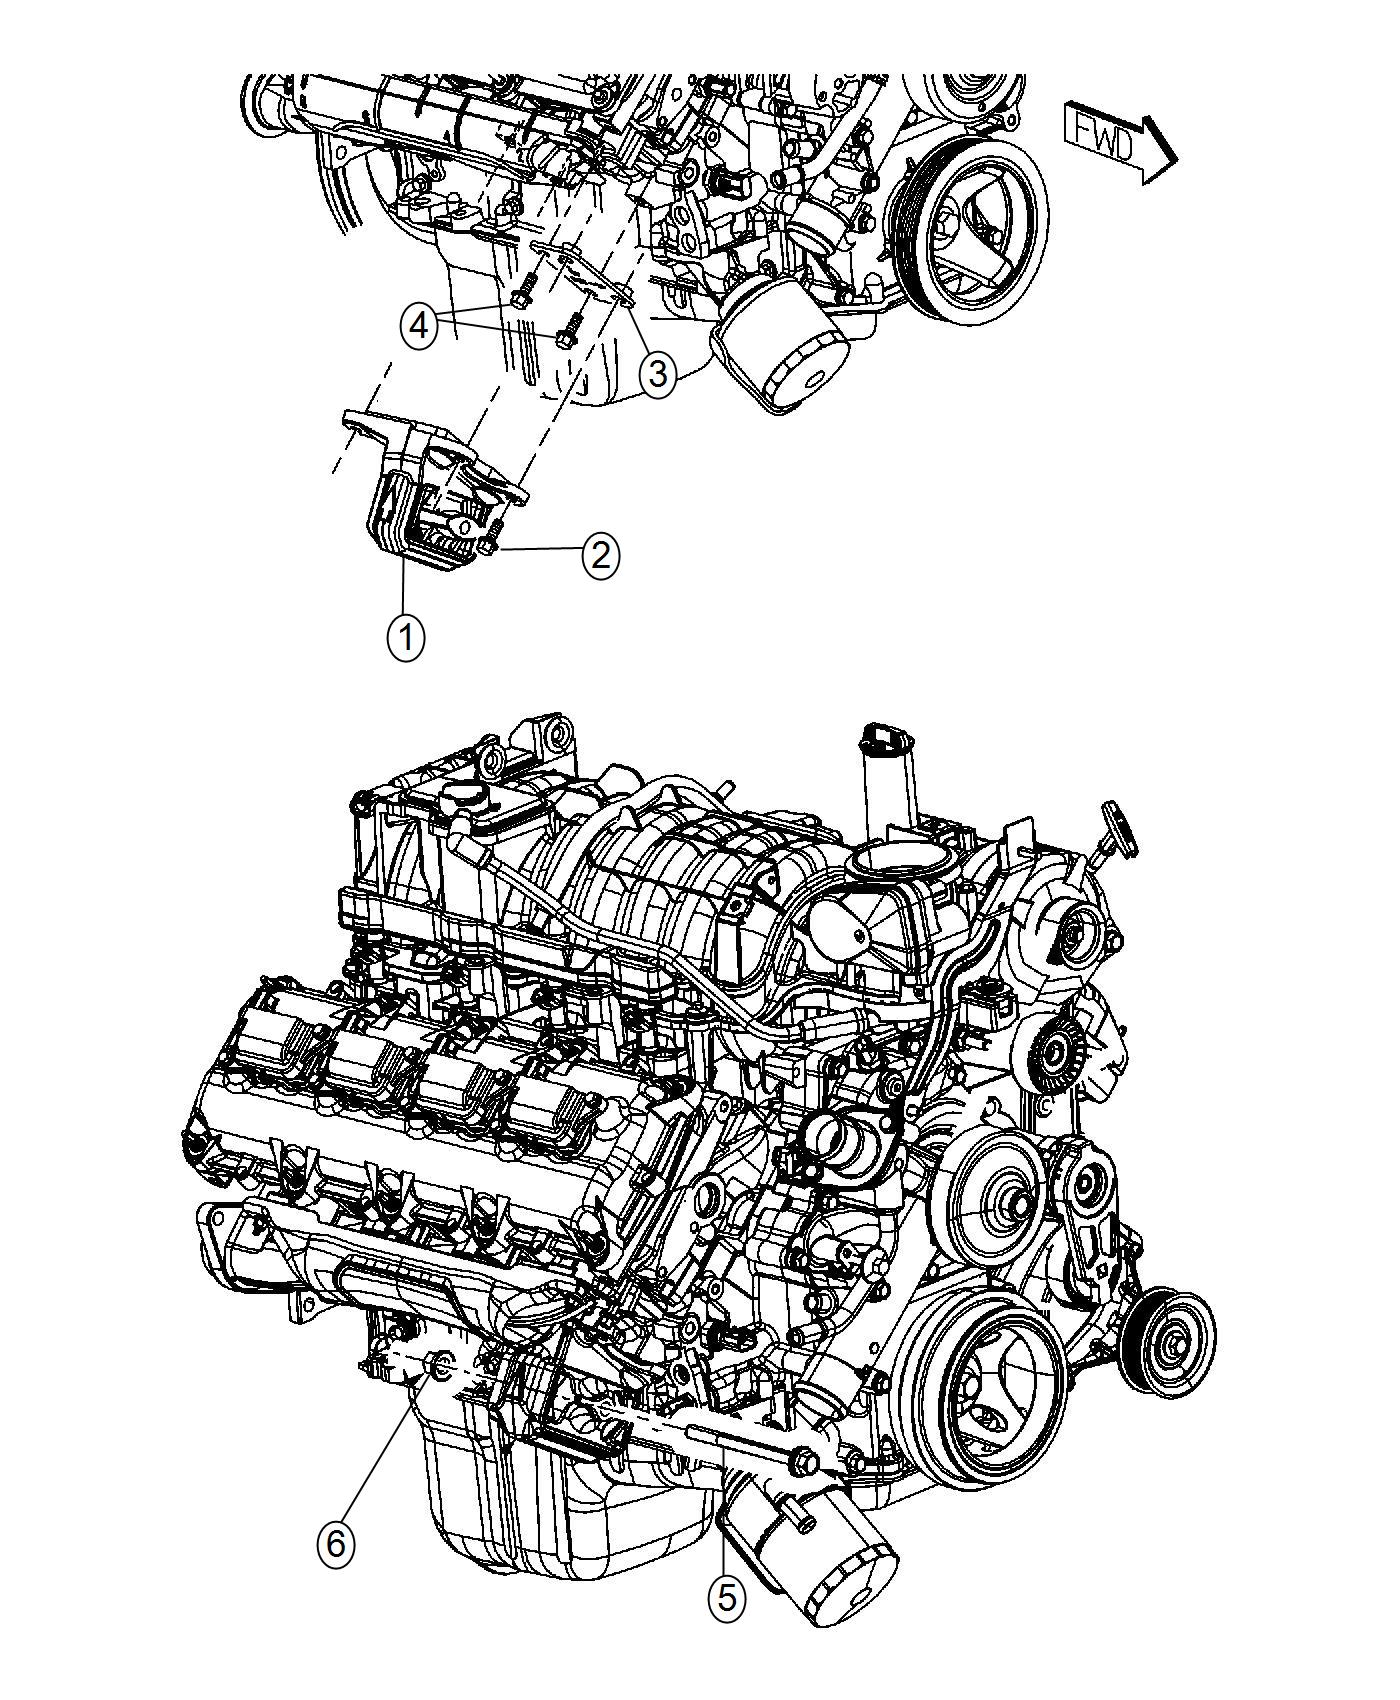 Ram Insulator Engine Mount Left Side Right